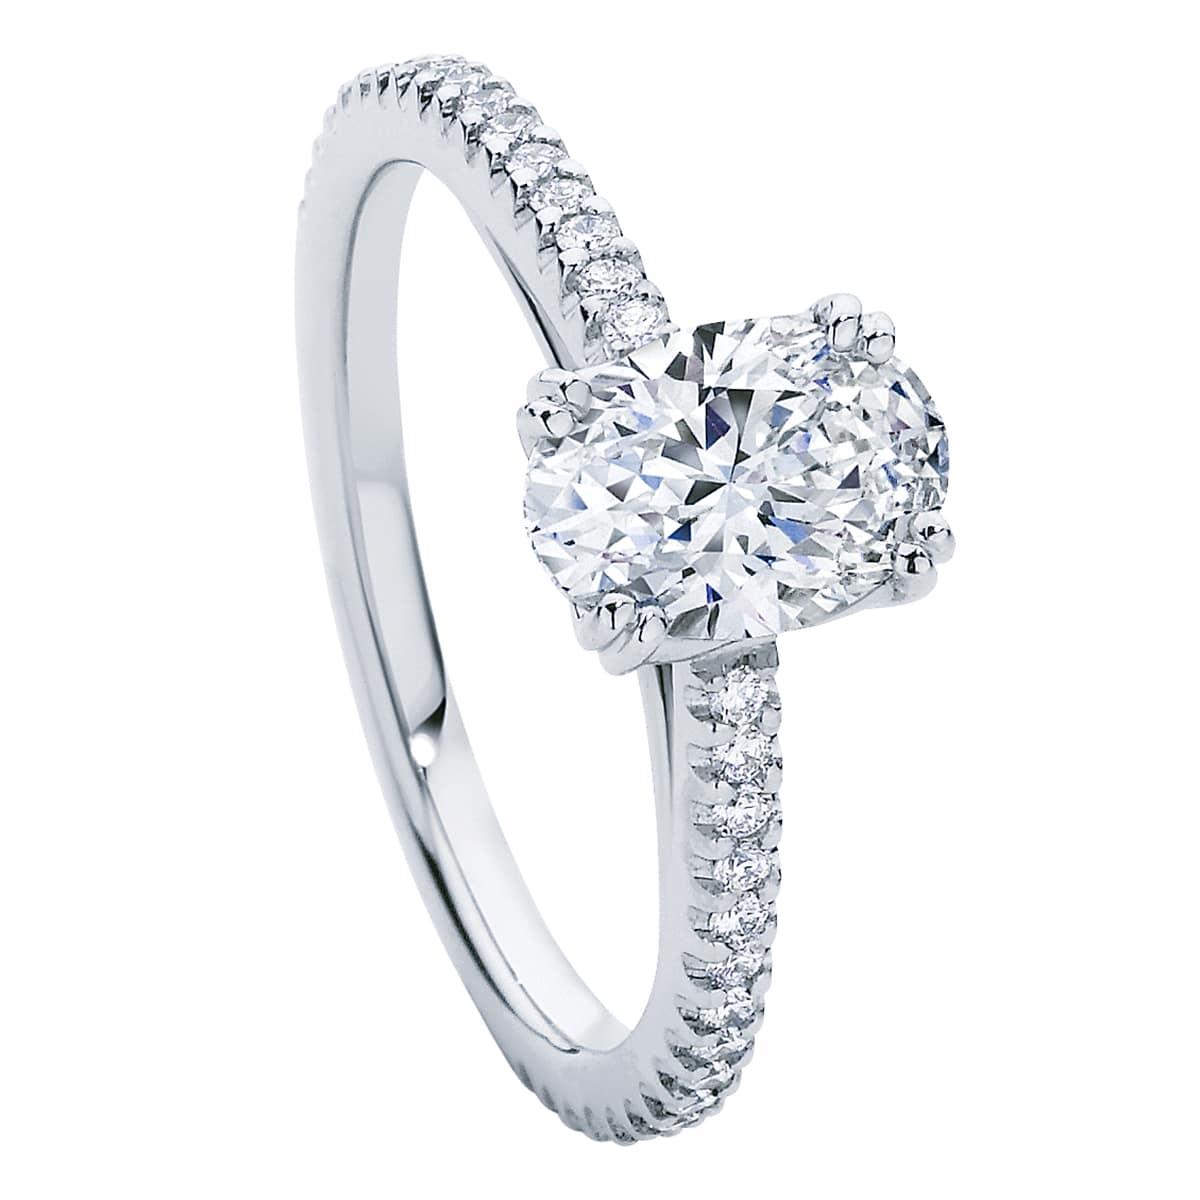 bachelor-australia-diamond-ring-for-matty